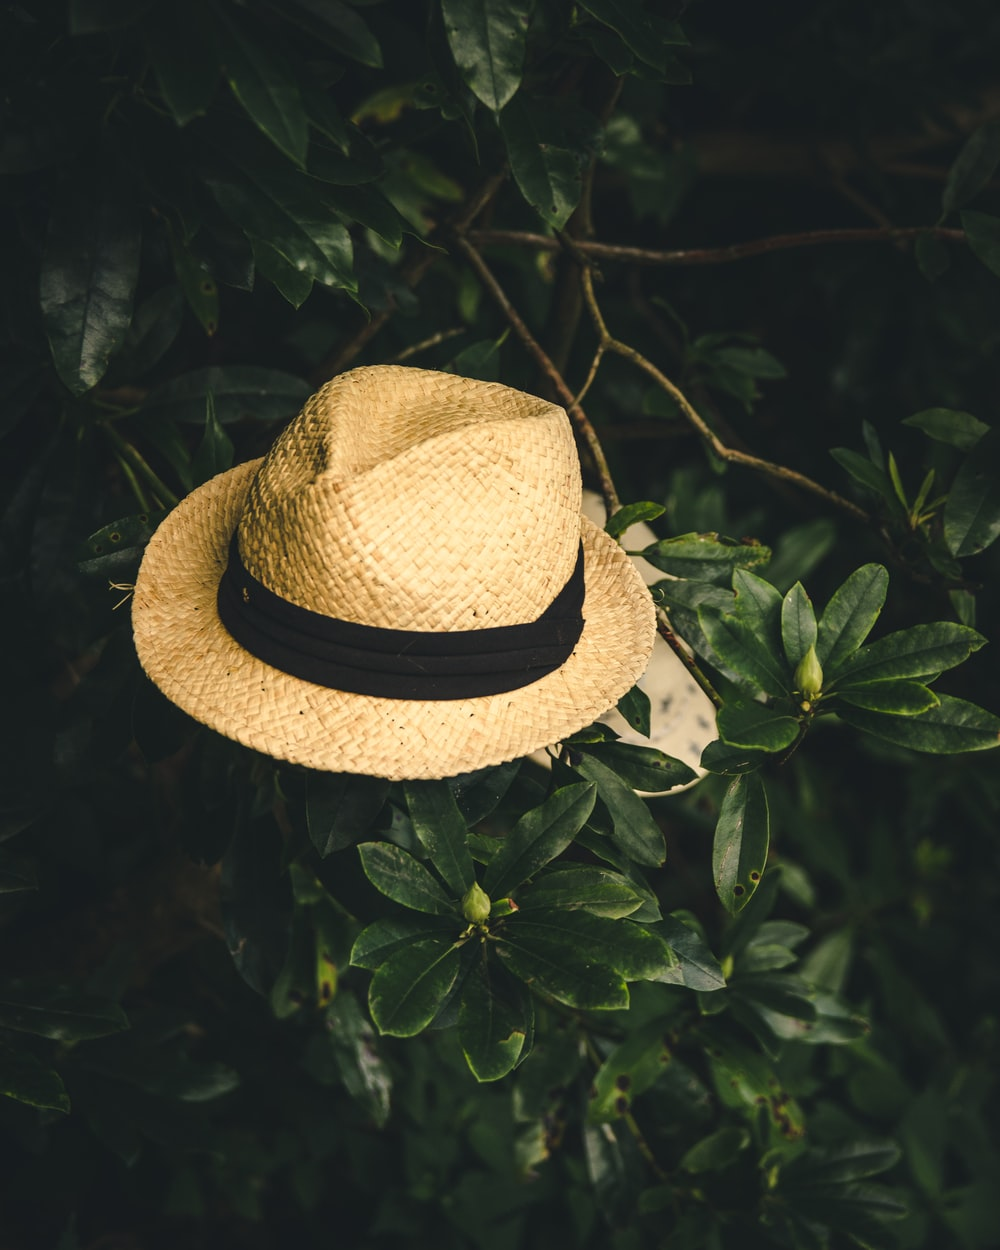 beige straw fedora hat on green leafed plant